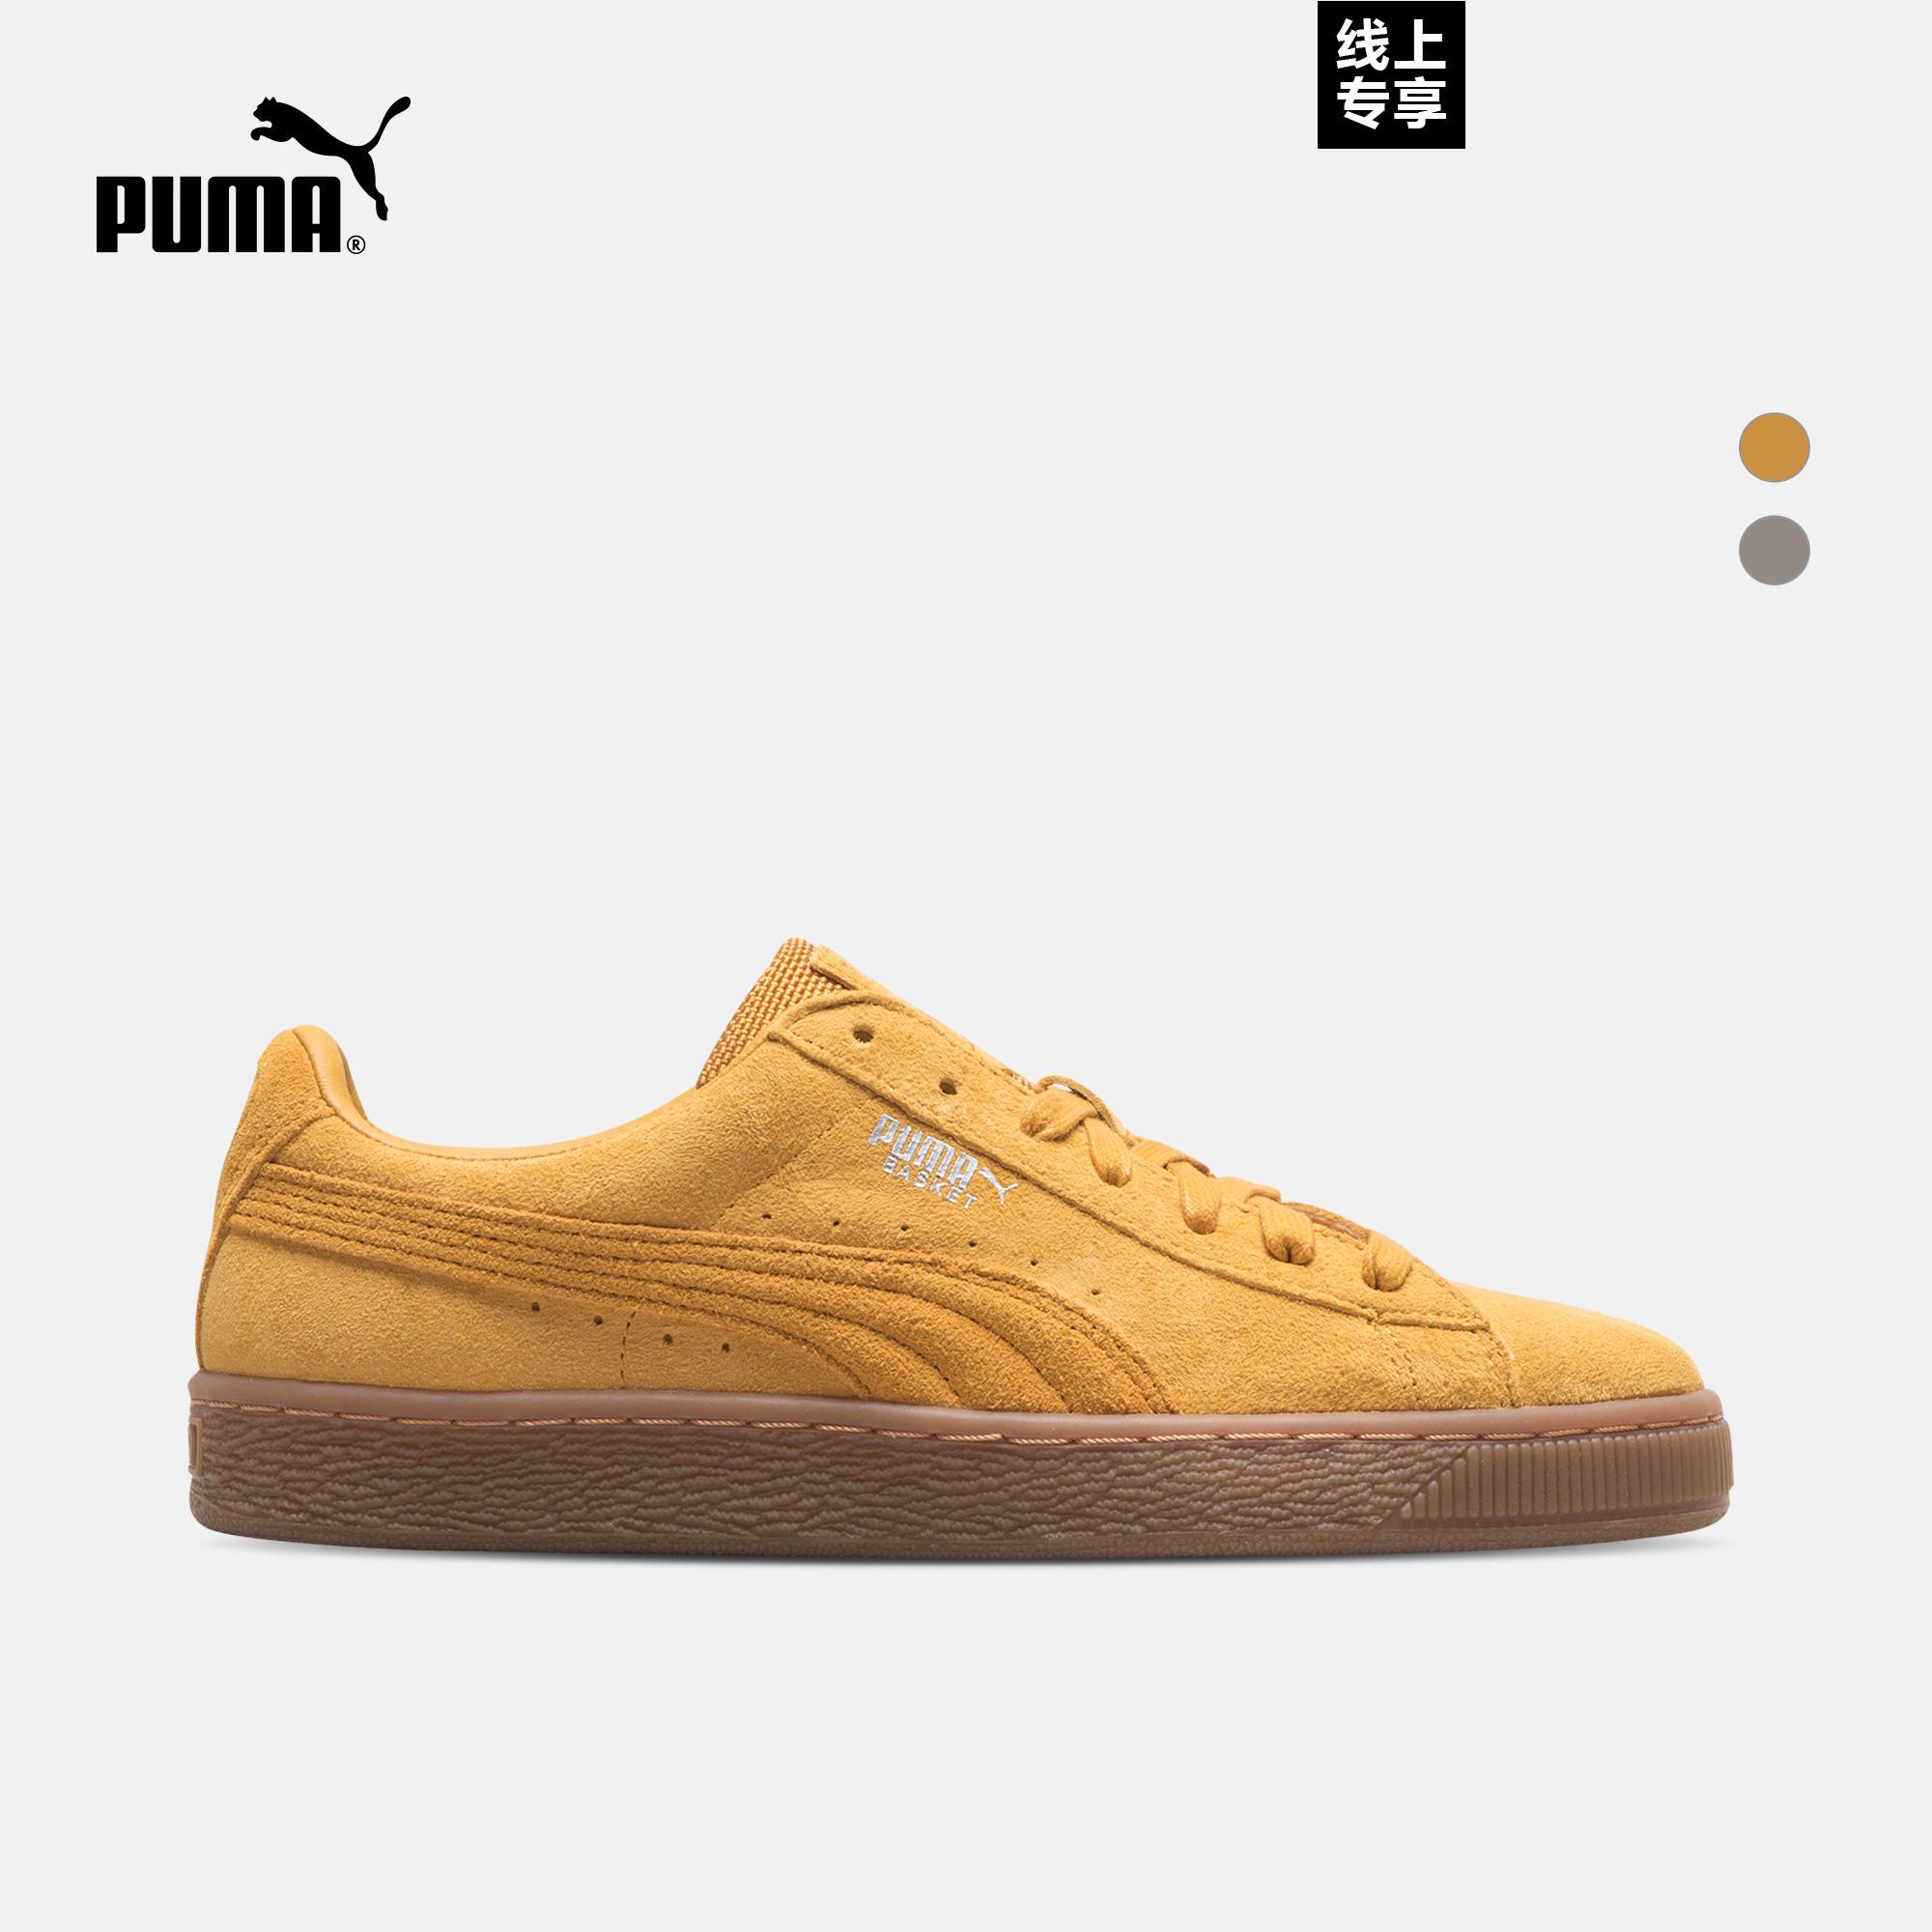 PUMA彪马官方 男女同款休闲鞋 Basket Classic 363829